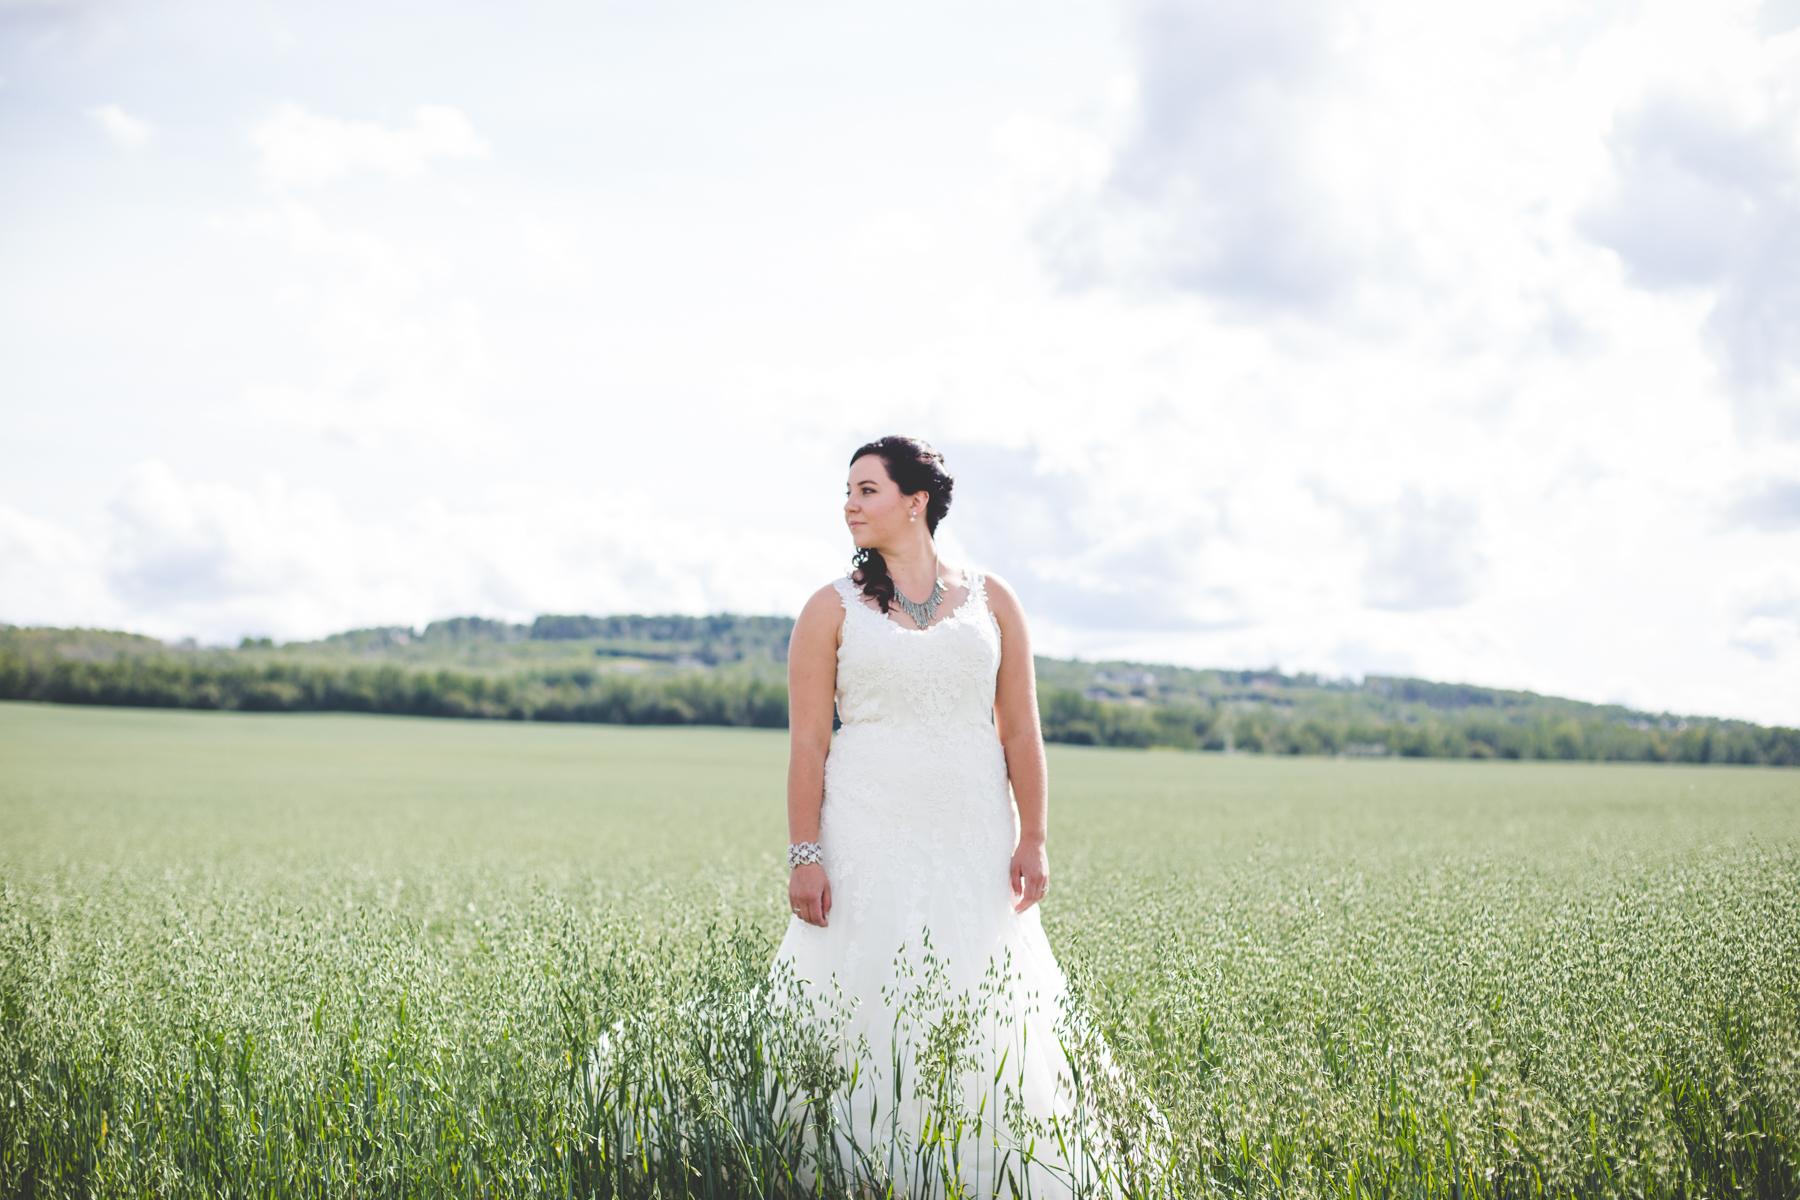 20150808-oglovewedding-7.jpg